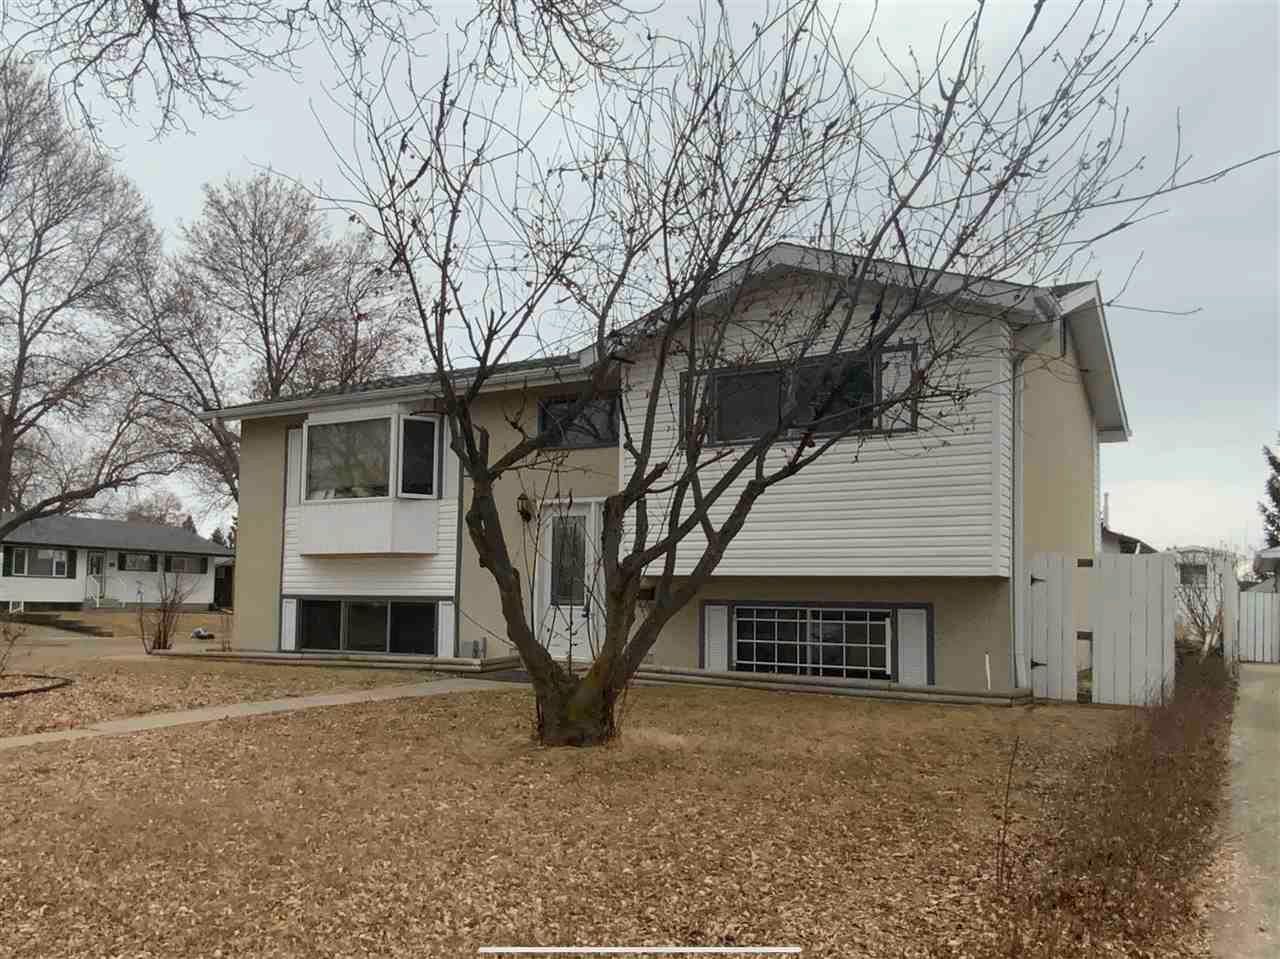 Main Photo: 5923 148 Avenue in Edmonton: Zone 02 House for sale : MLS®# E4236170